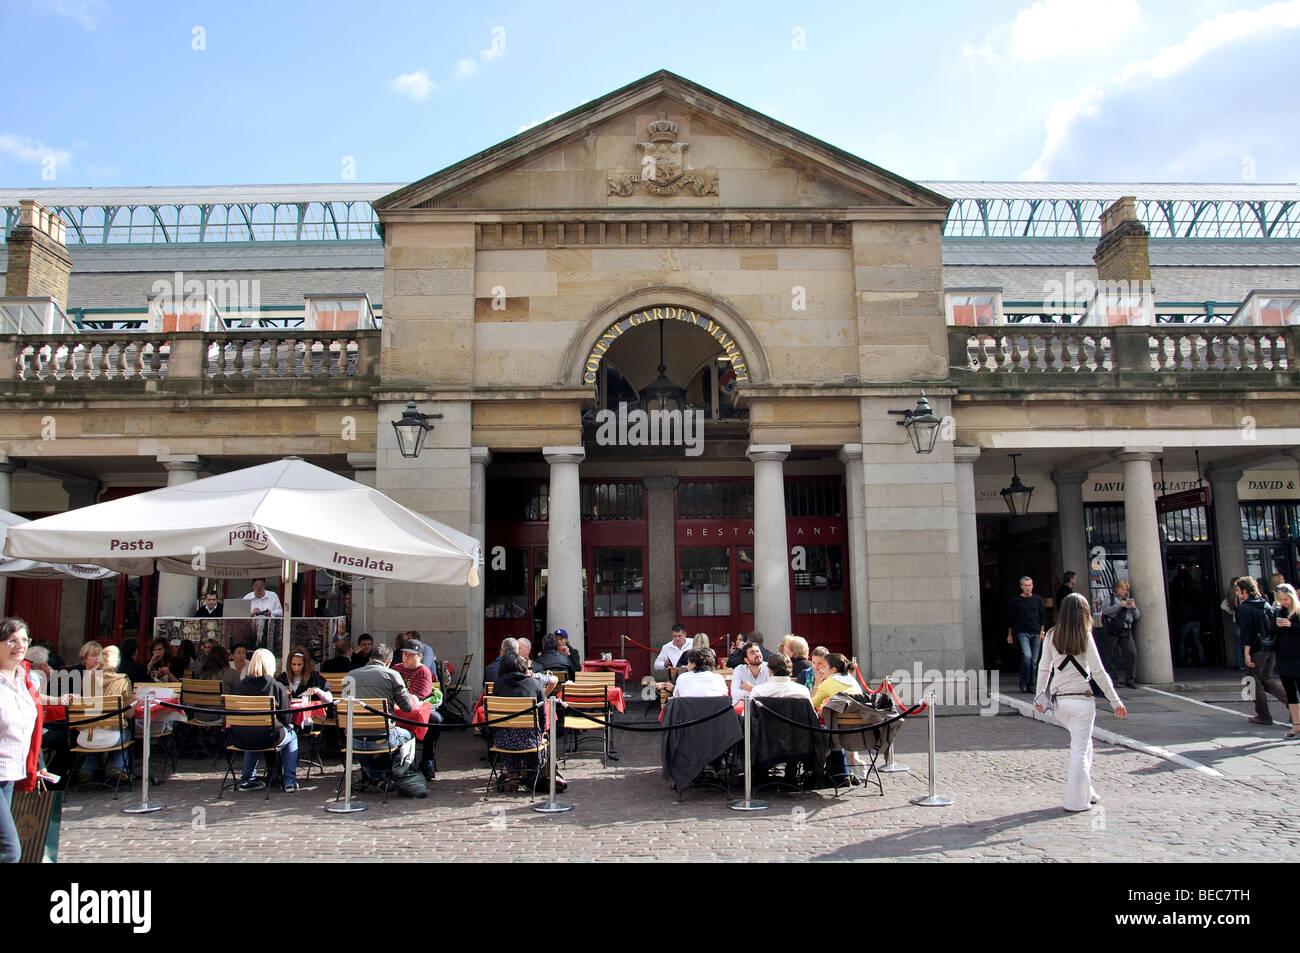 Cafes restaurants covent garden market stockfotos cafes for Cafe de jardin in covent garden